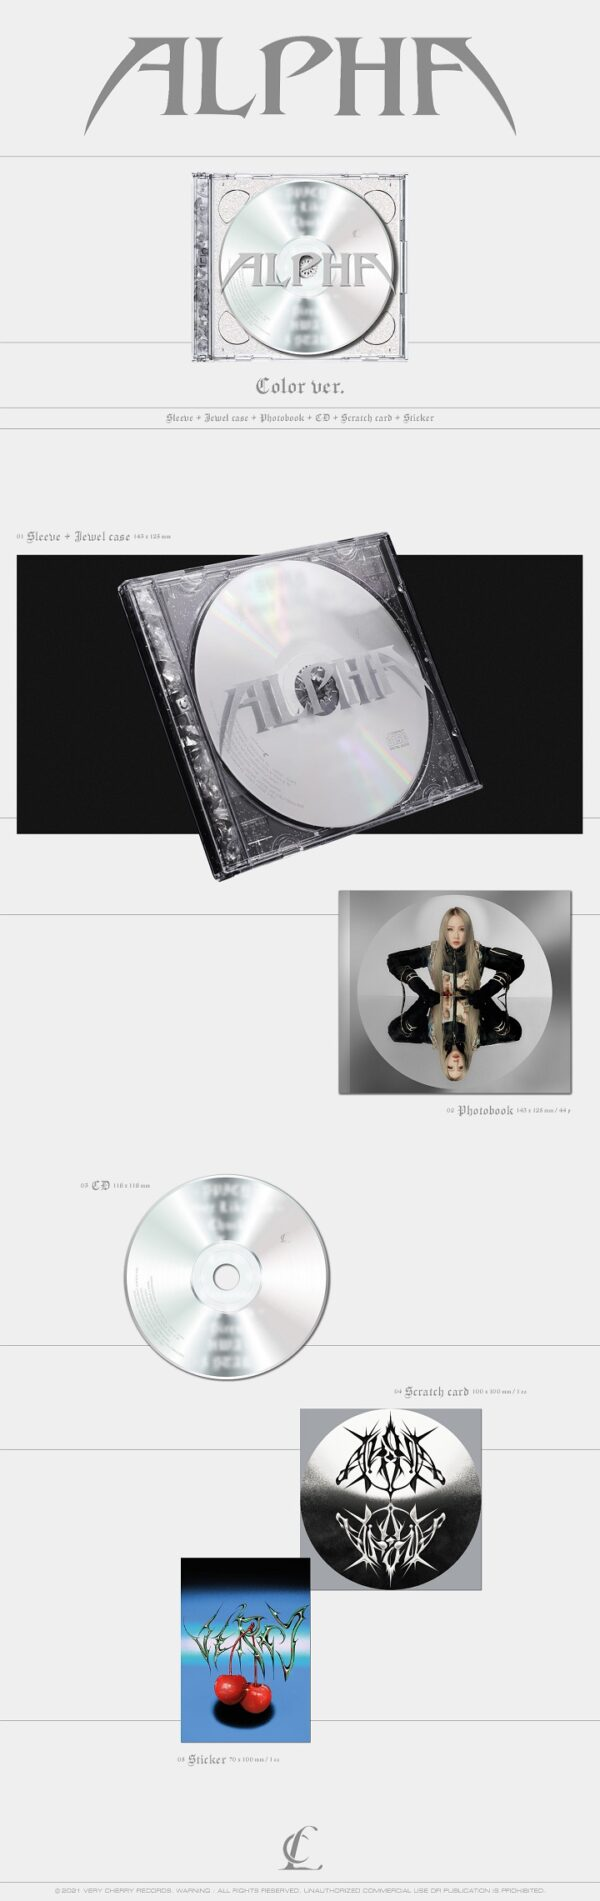 Album de CL ALPHA Color Ver. 1